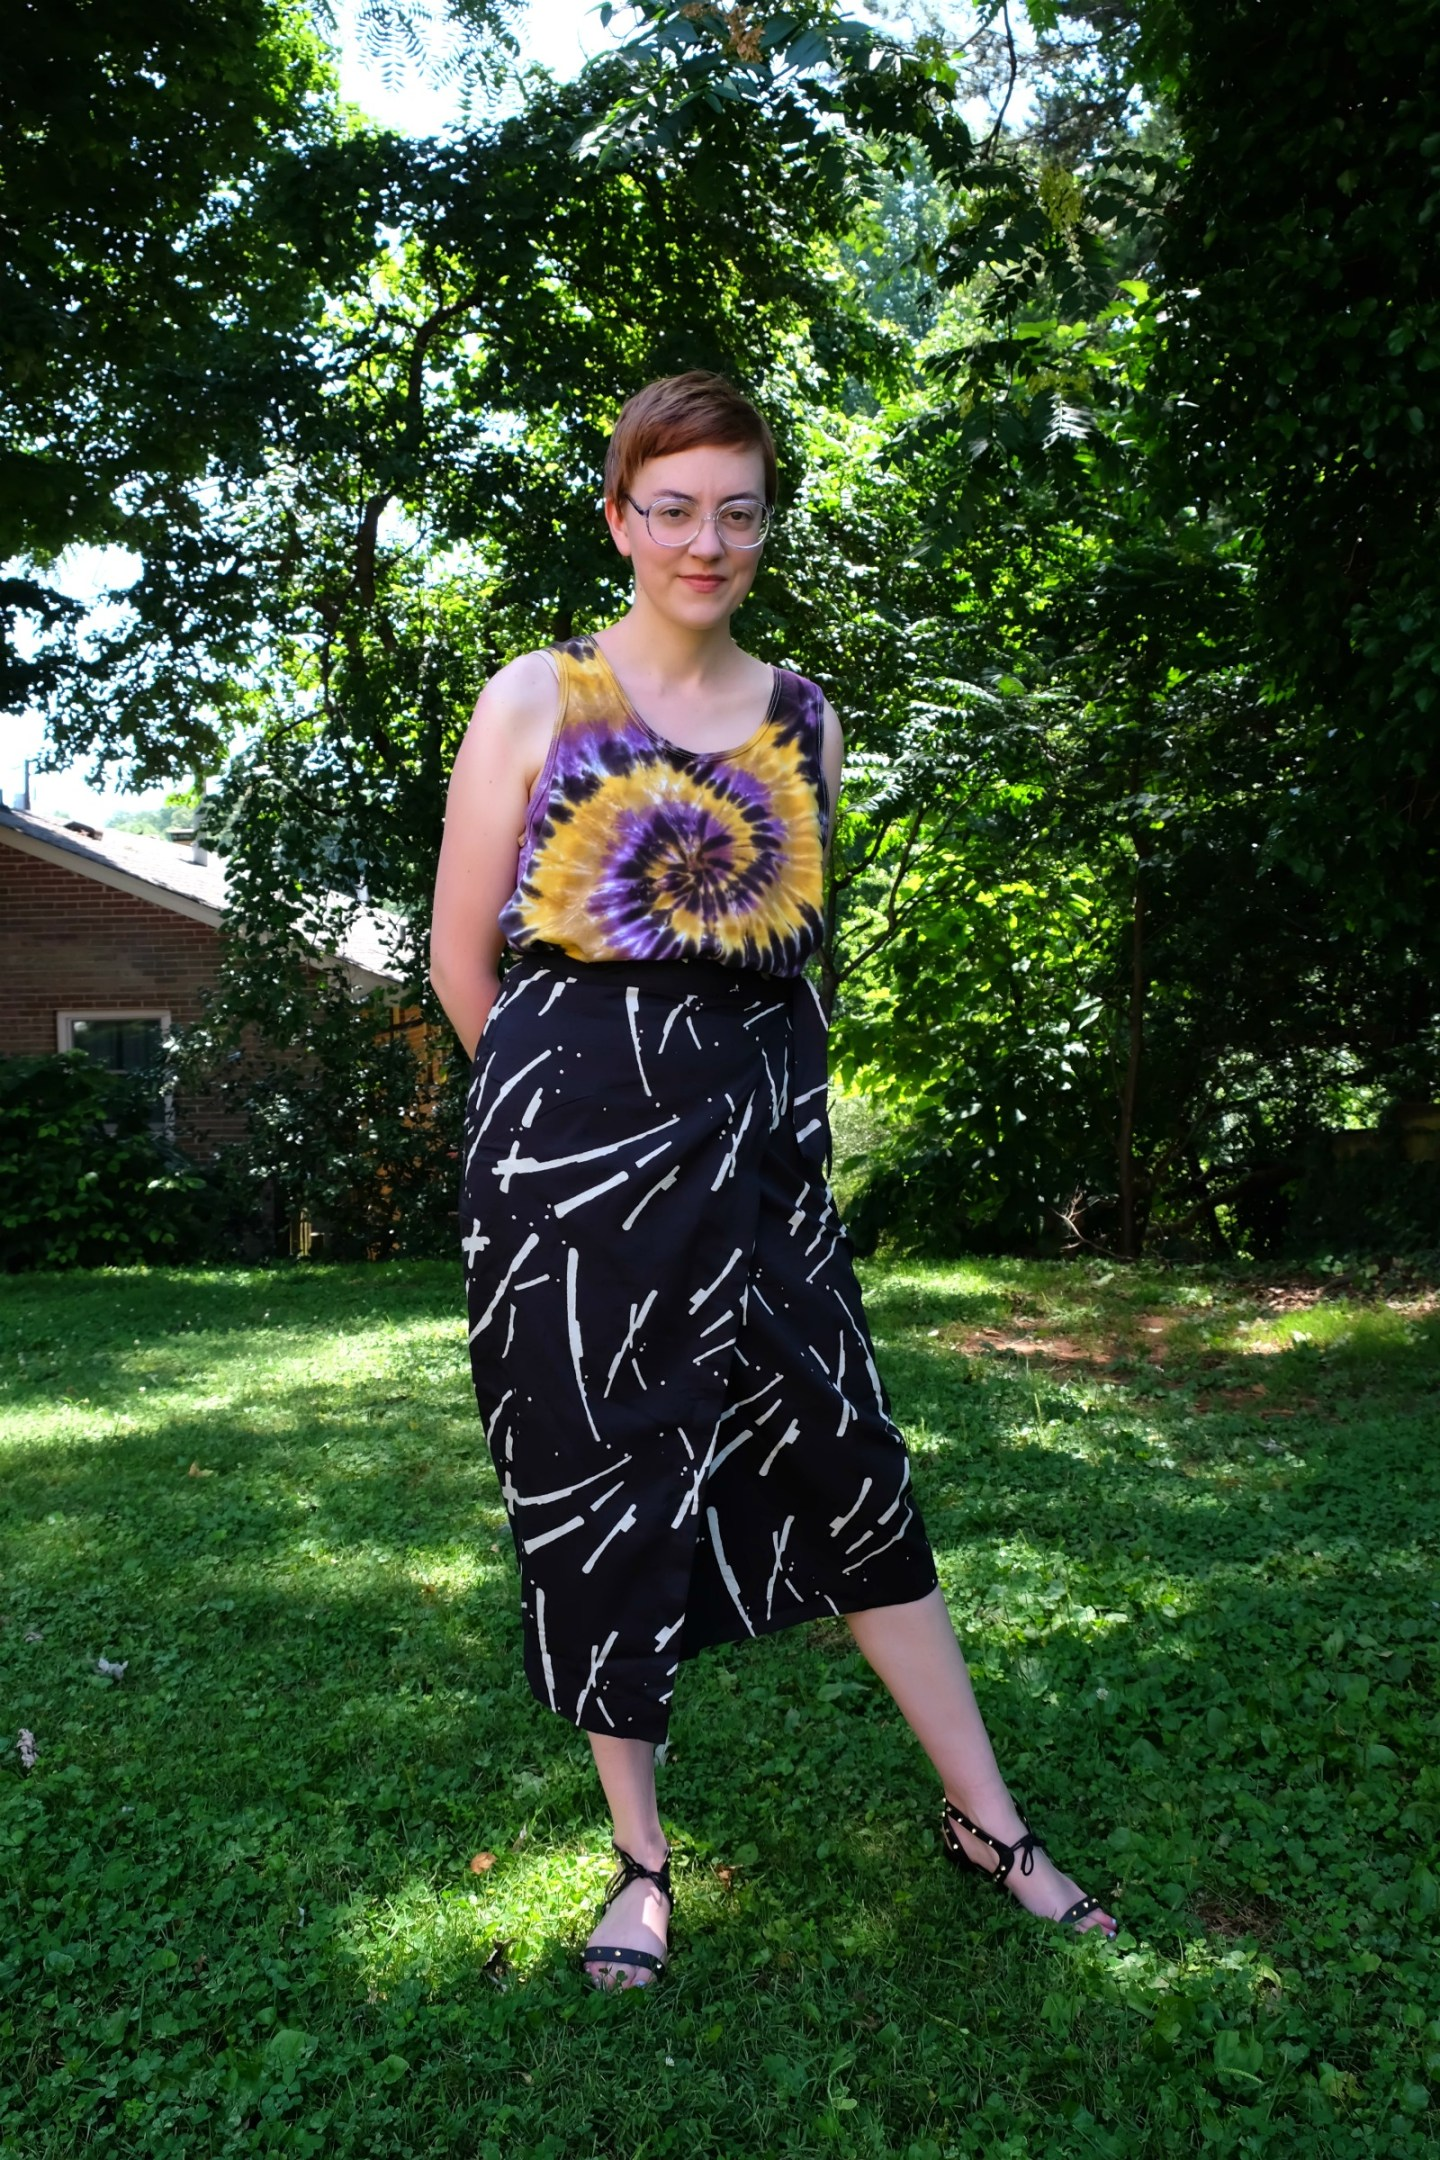 Ethical Details - Tank Top - thrifted; Skirt - c/o  MATTER ; Sandals -  Melissa ; Nose Stud - c/o  Metal Lotus